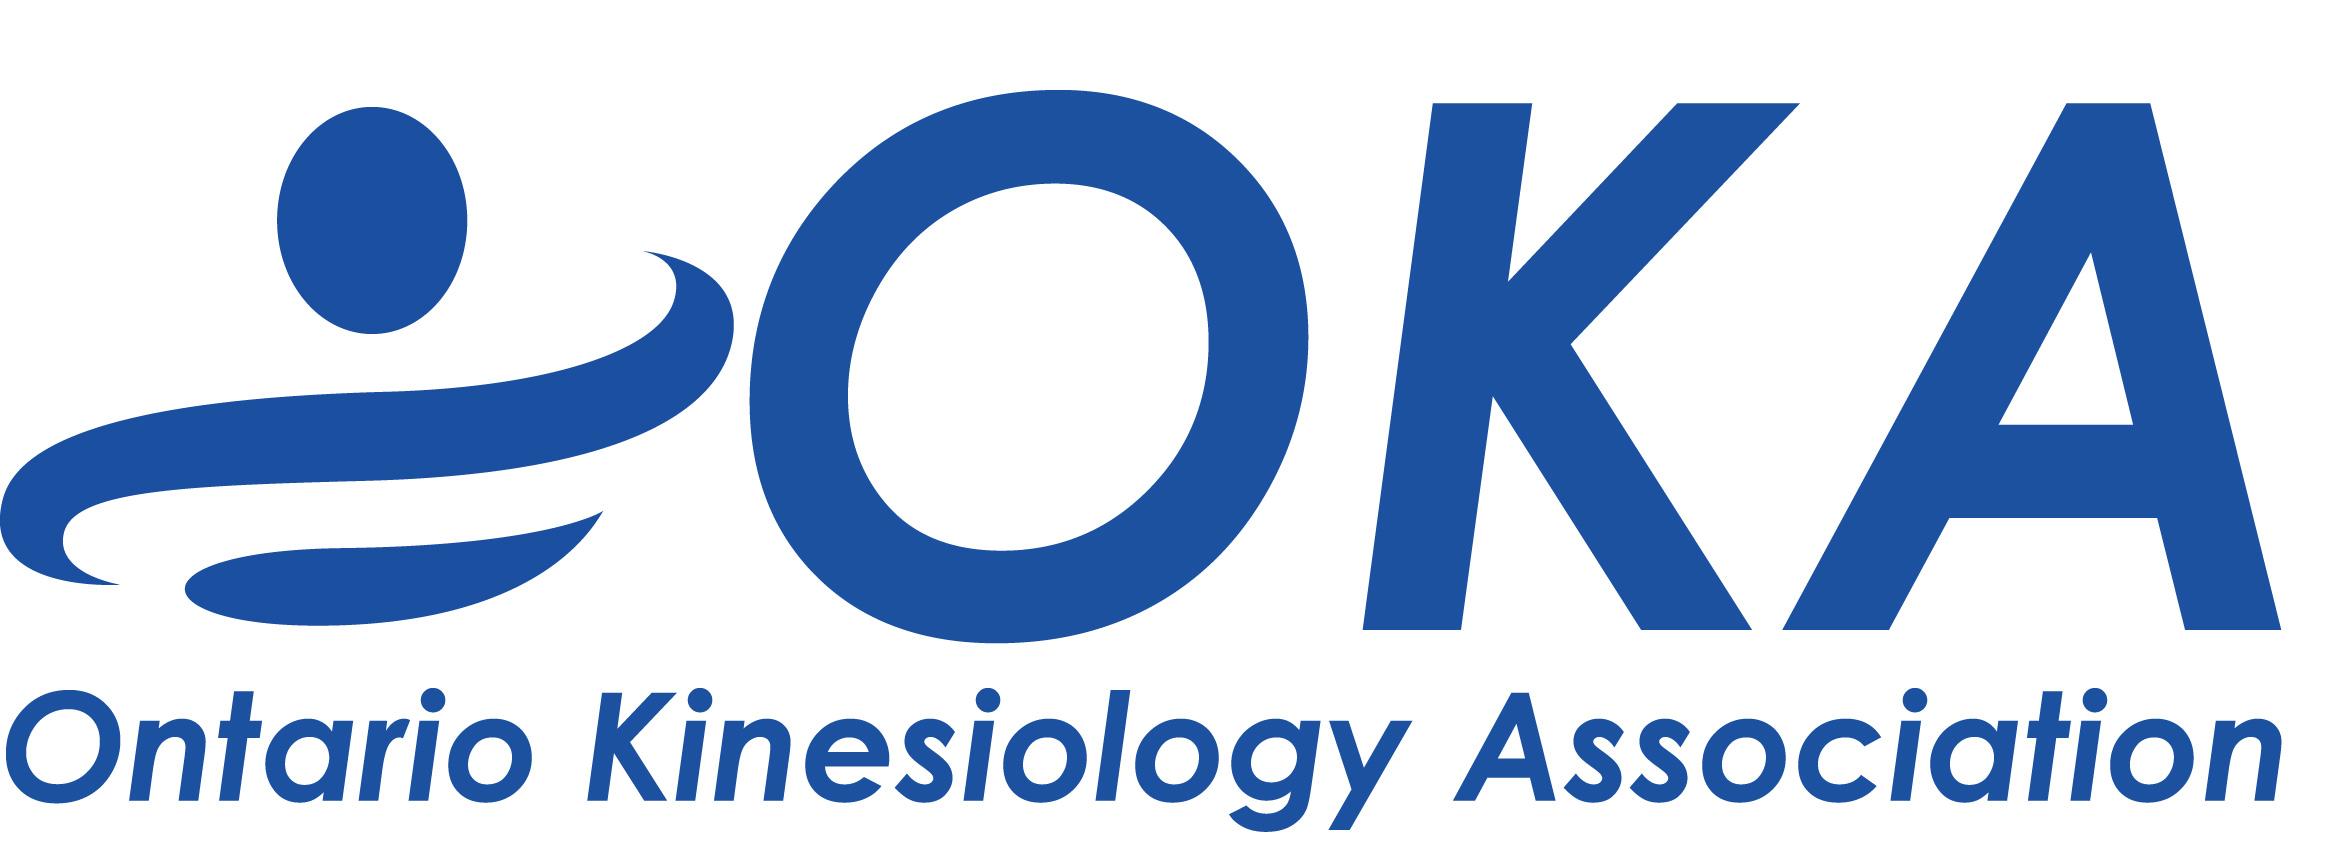 Ontario Kinesiology Association